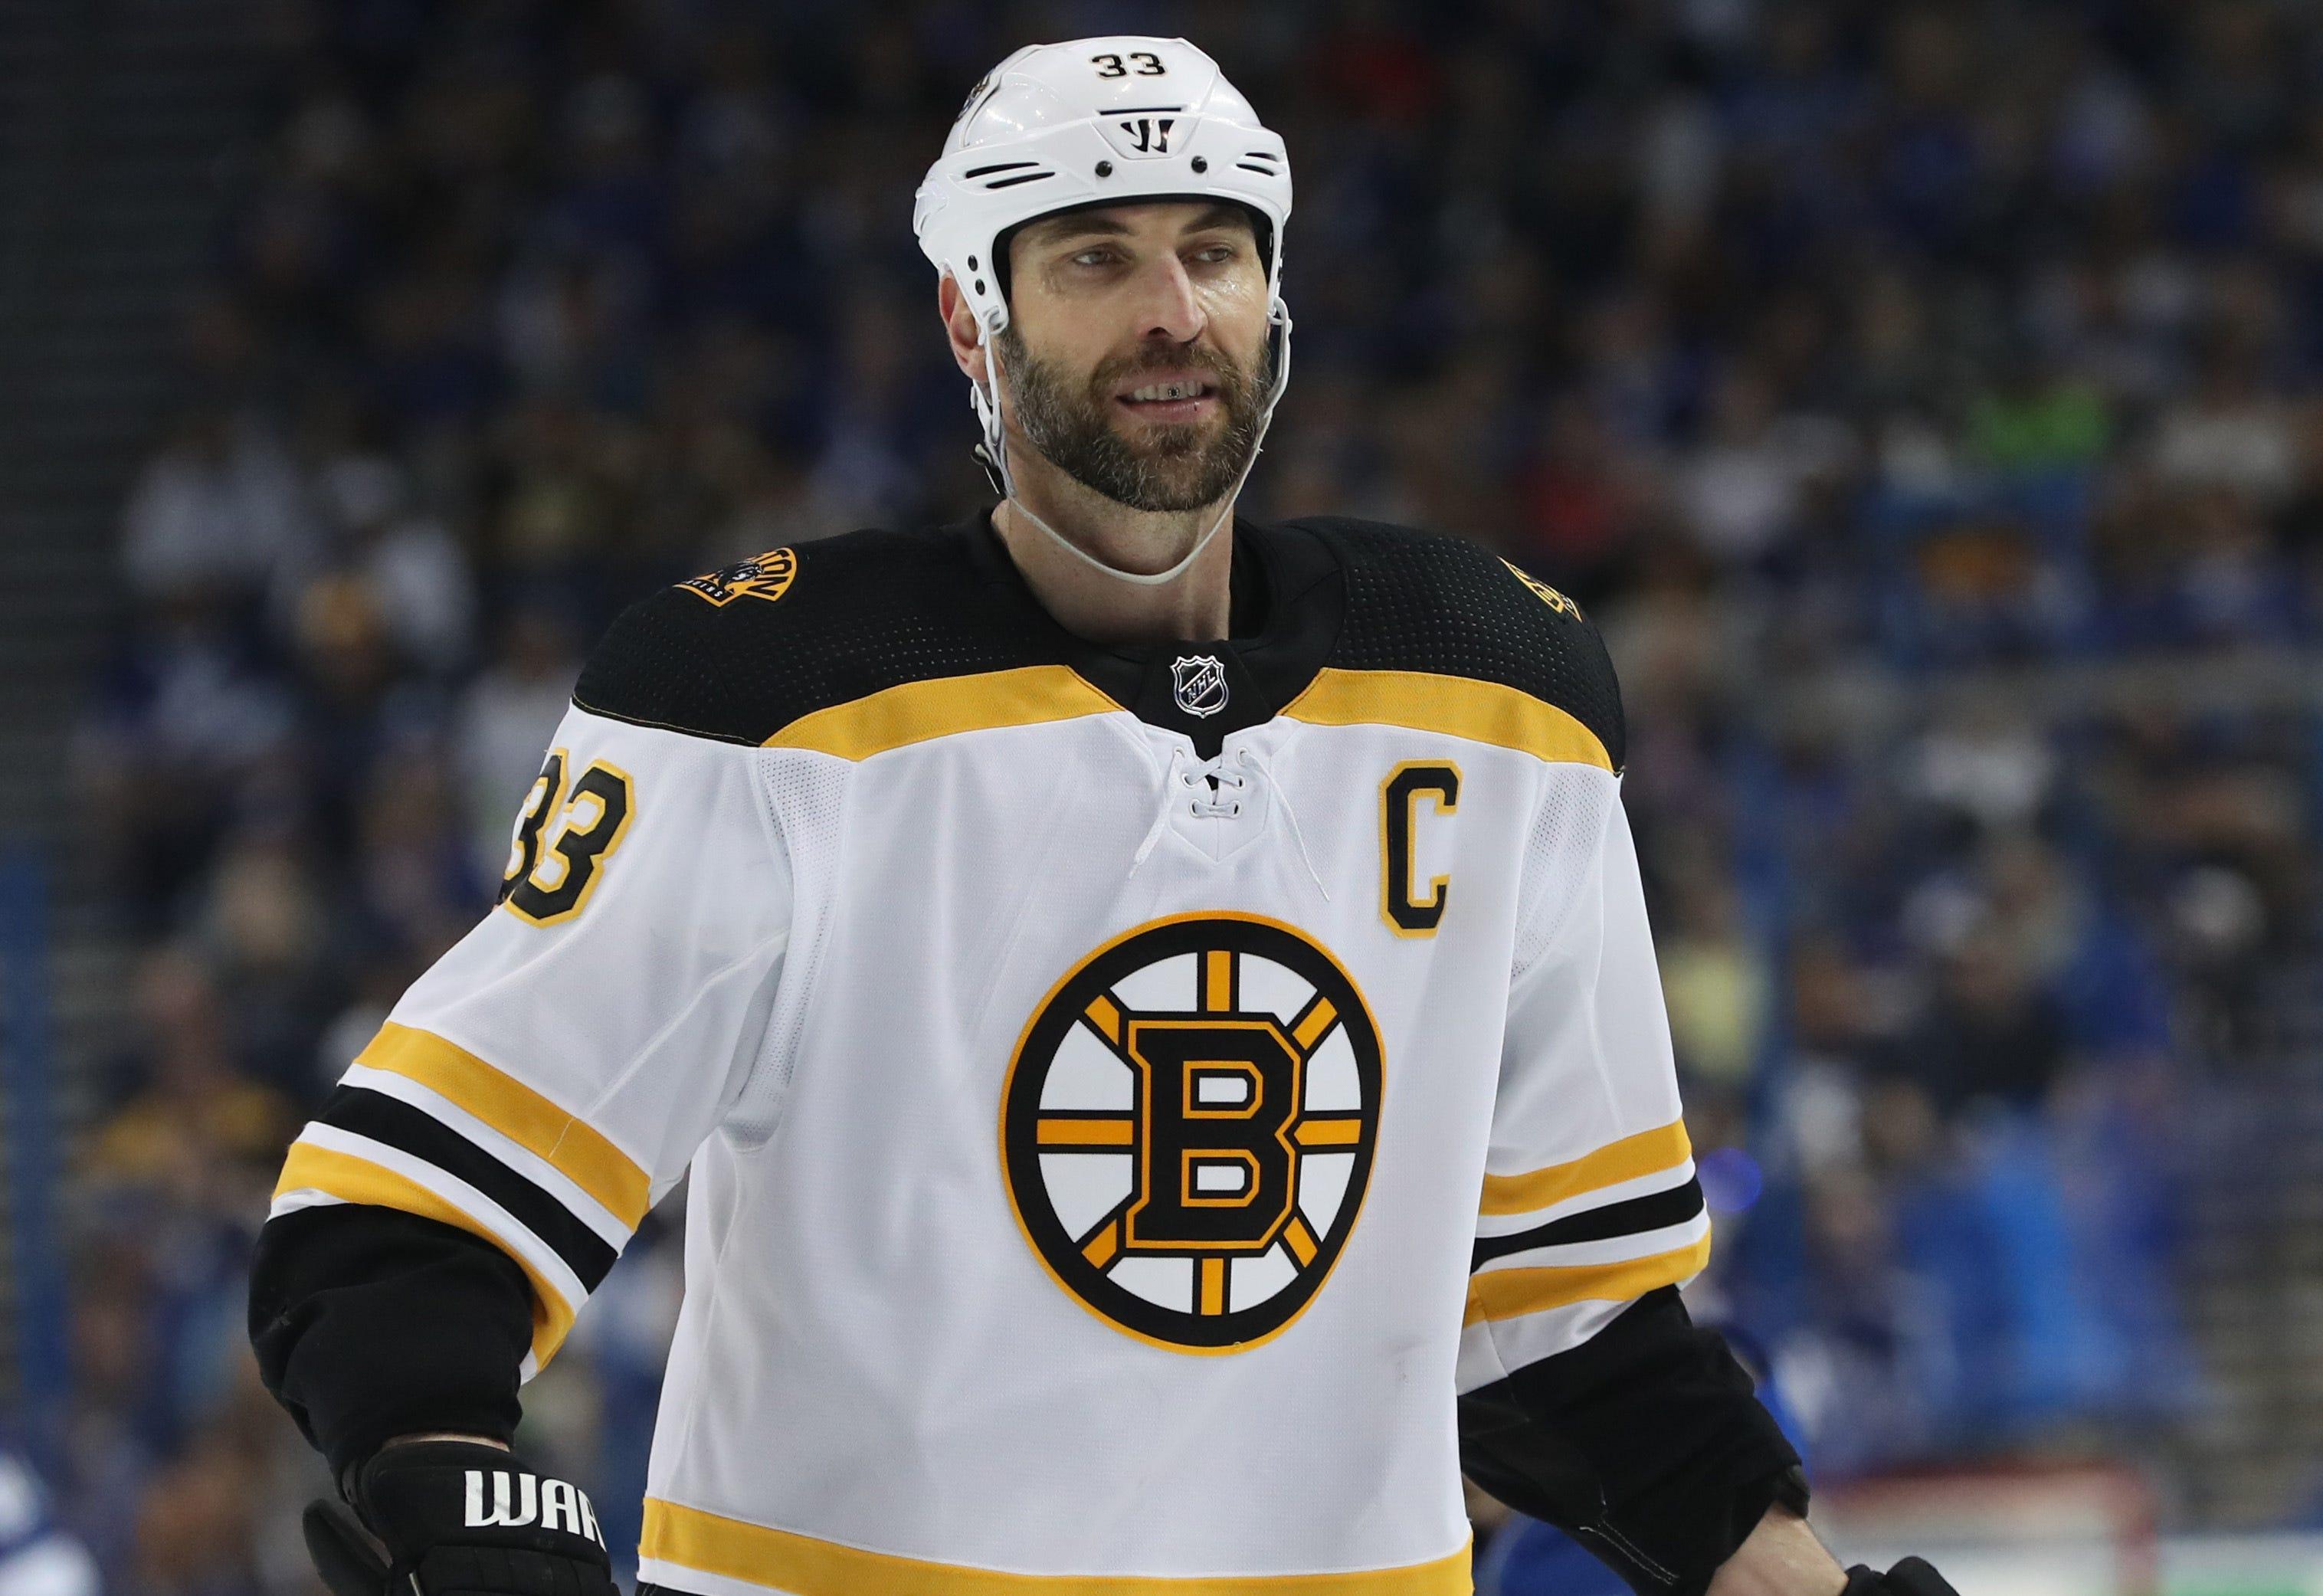 Good Problems Is Zdeno Chara Still The Best Defenseman On The Bruins